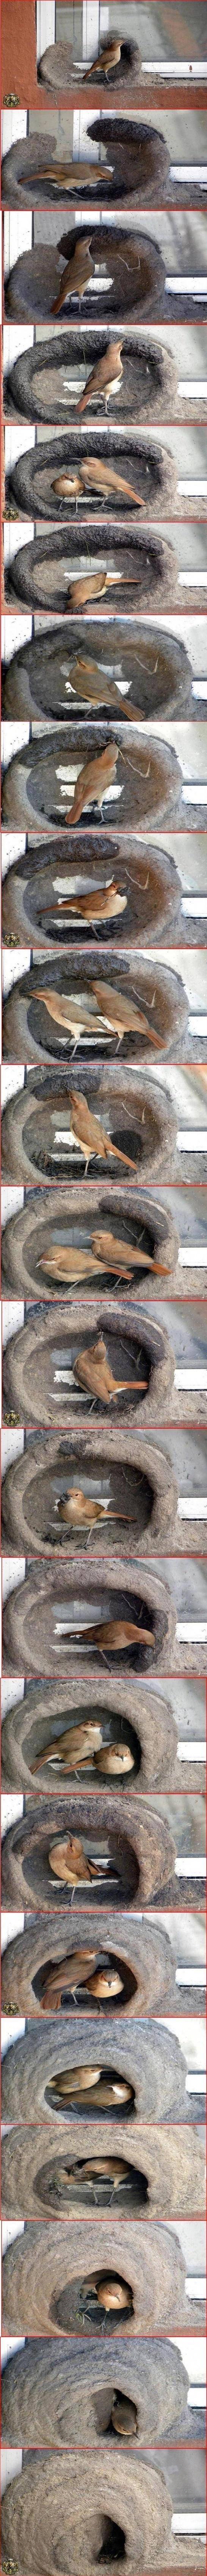 red oven birds building nest. .